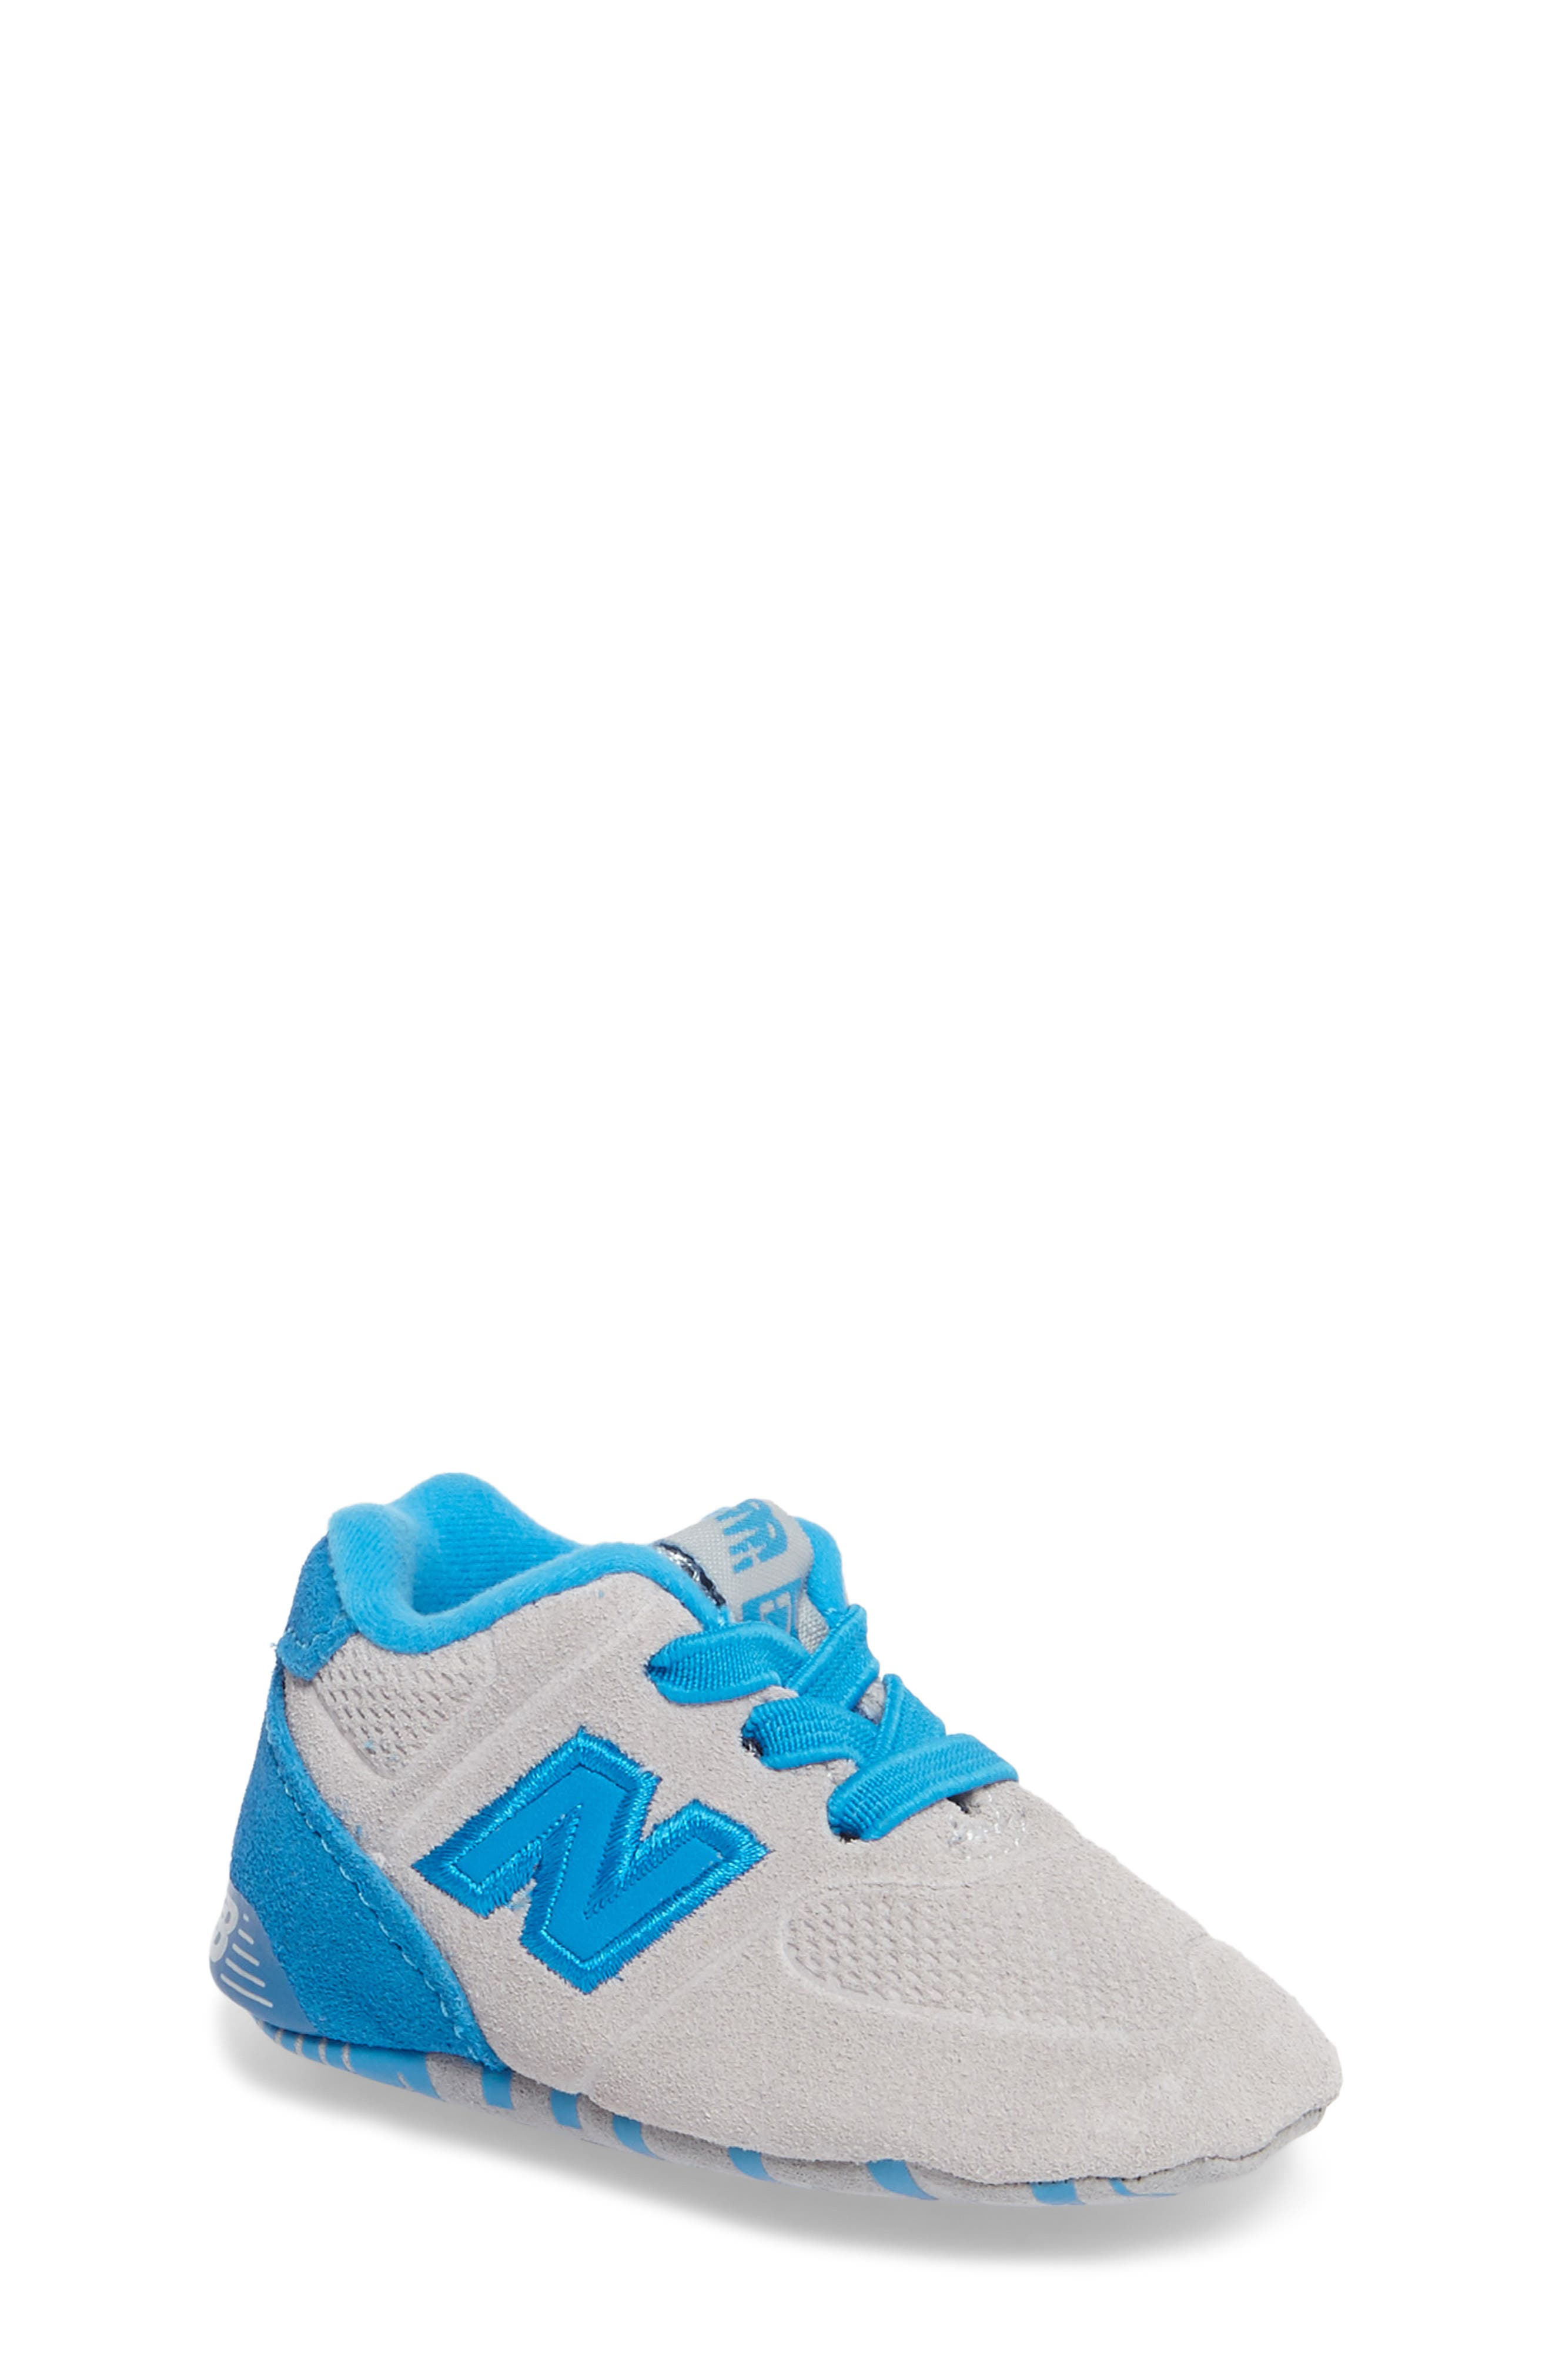 Alternate Image 1 Selected - New Balance 547 Crib Shoe (Baby)